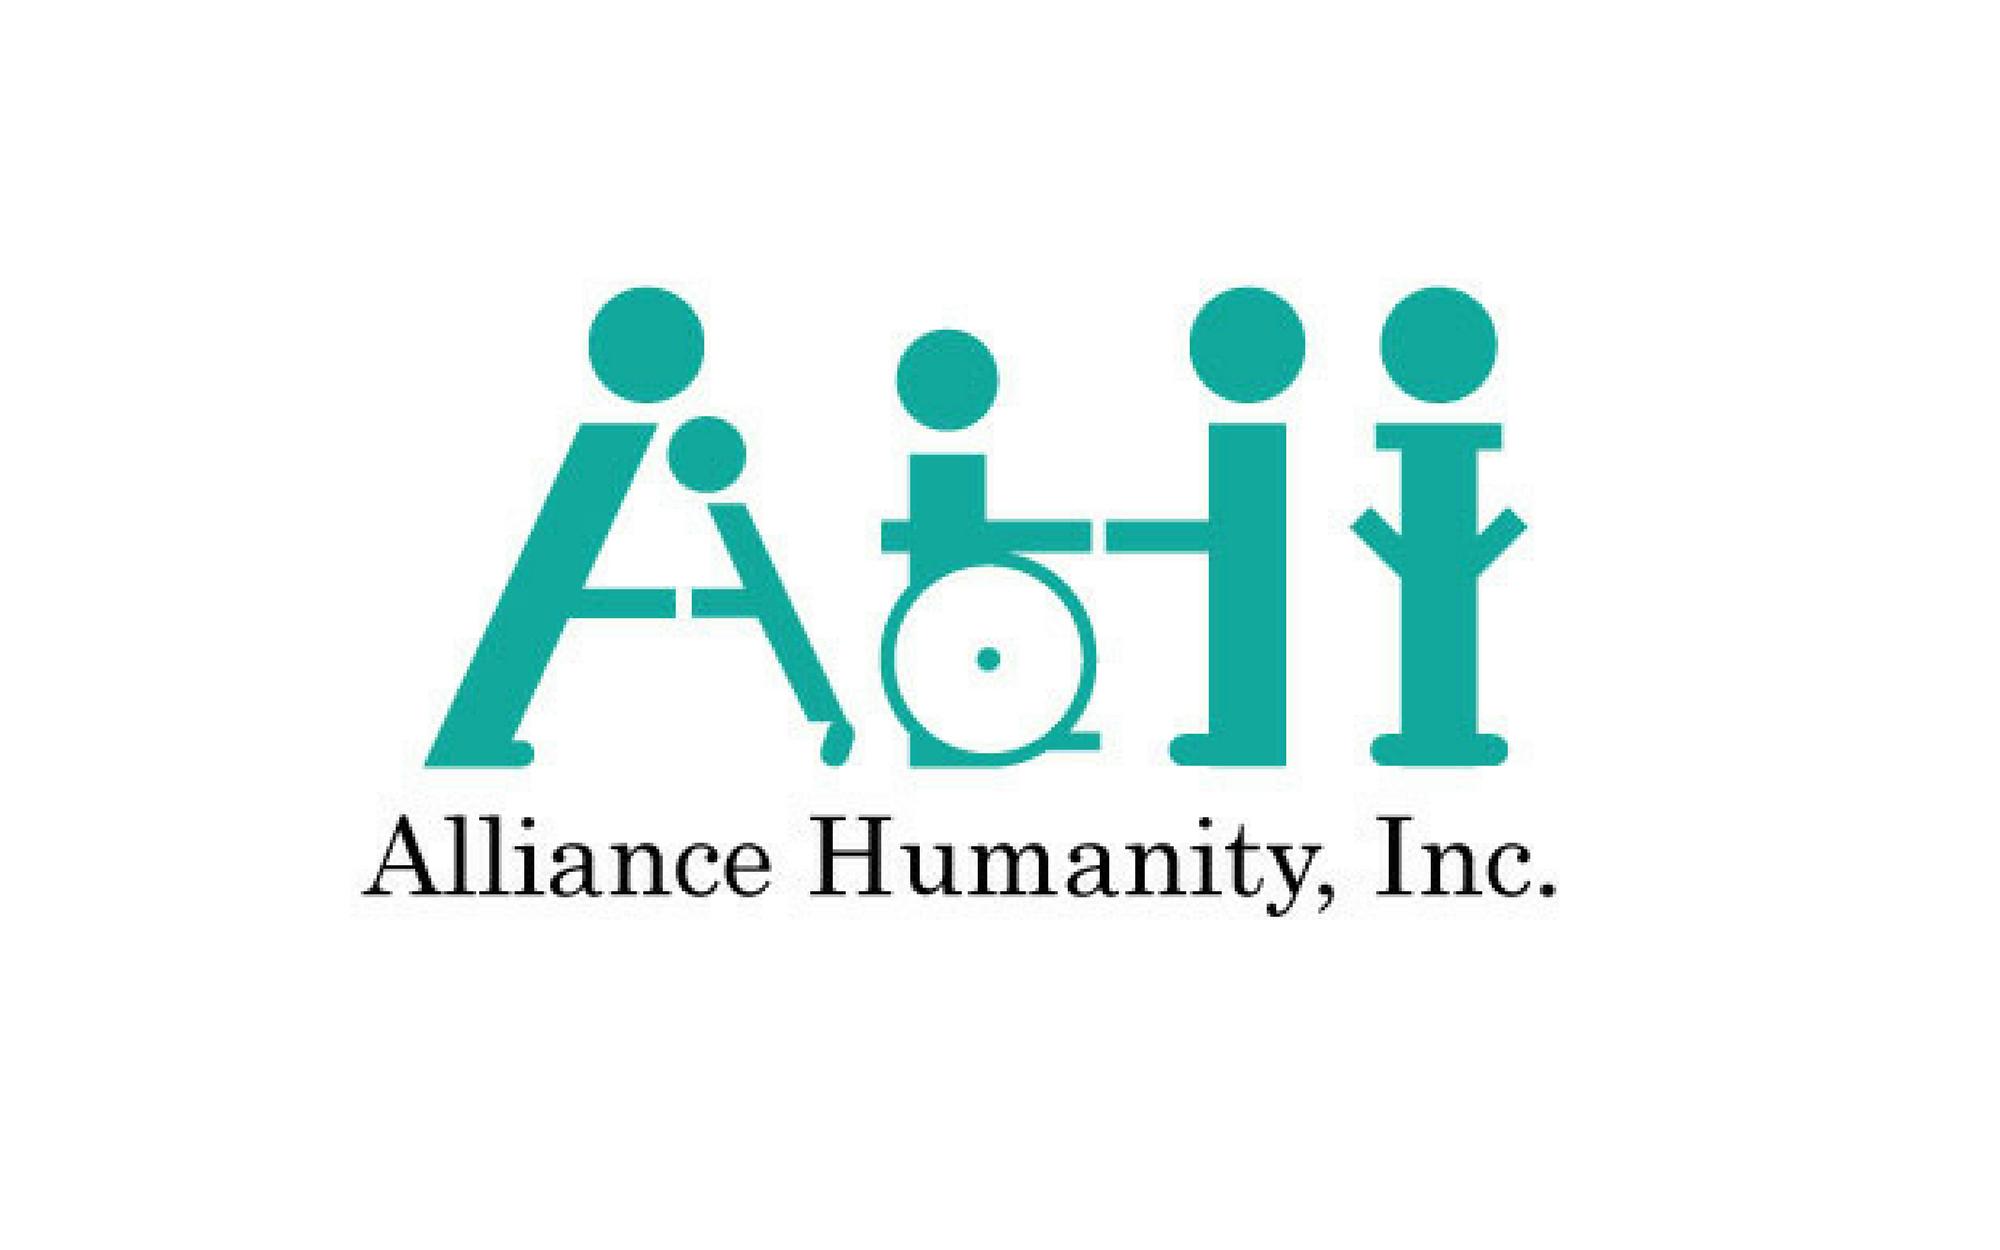 Alliance Humanity, Inc